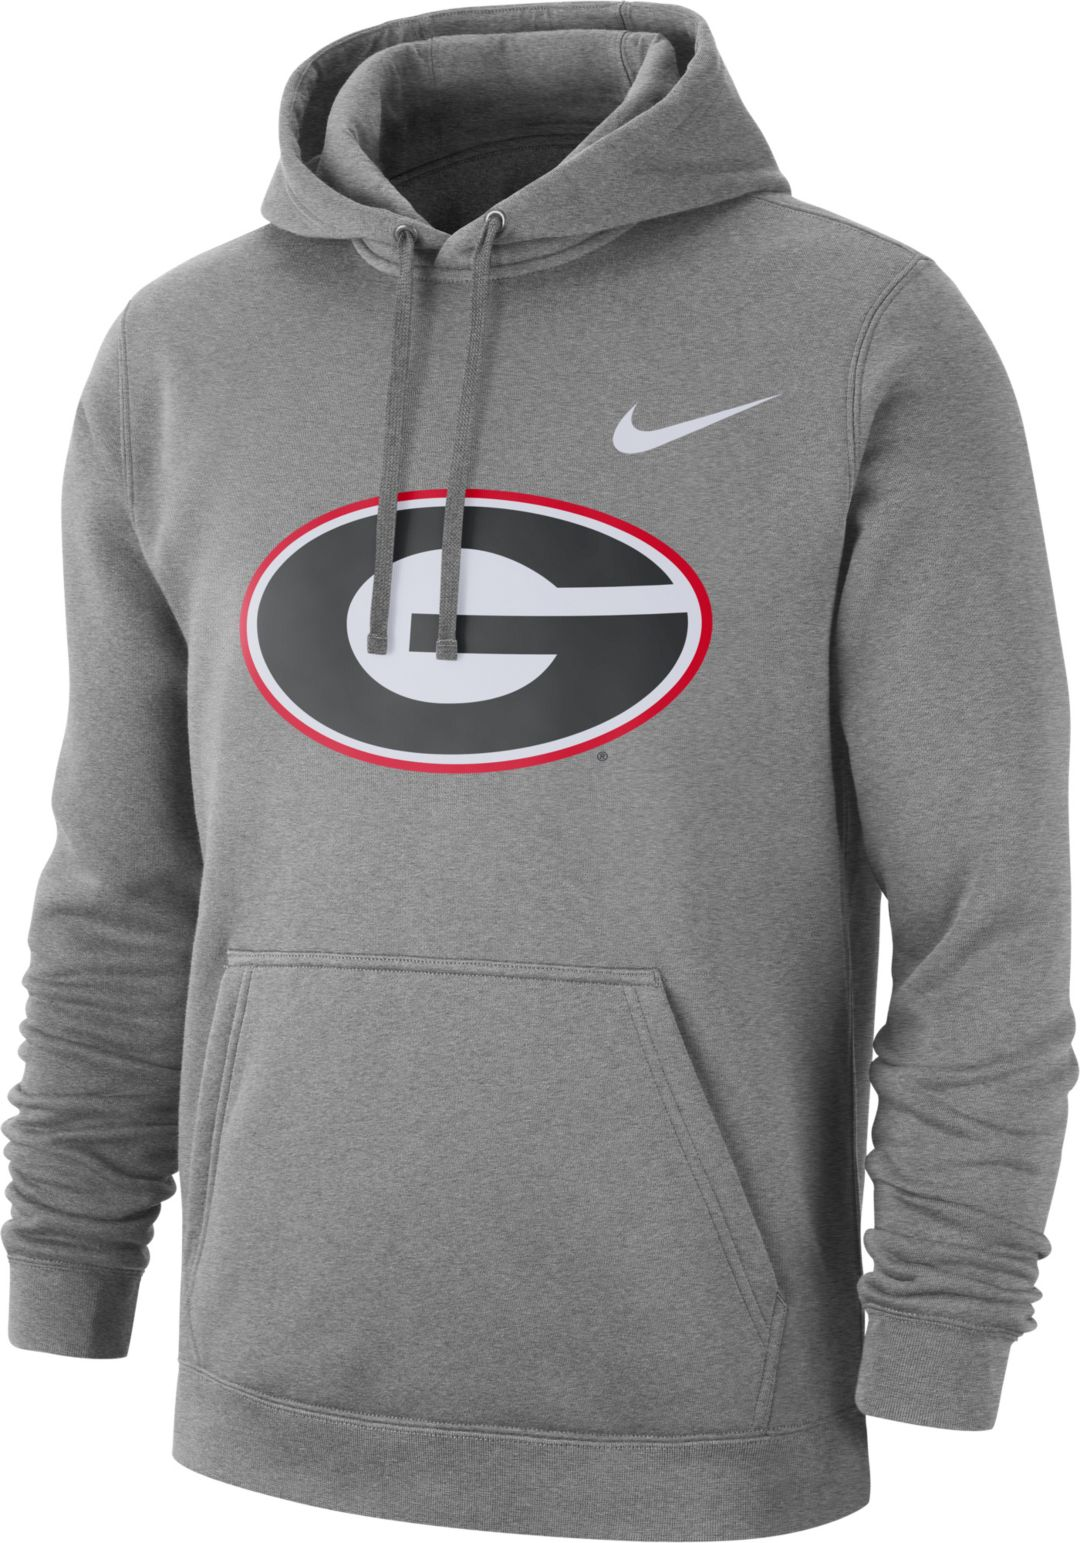 1dca58c6 Nike Men's Georgia Bulldogs Grey Club Fleece Pullover Hoodie